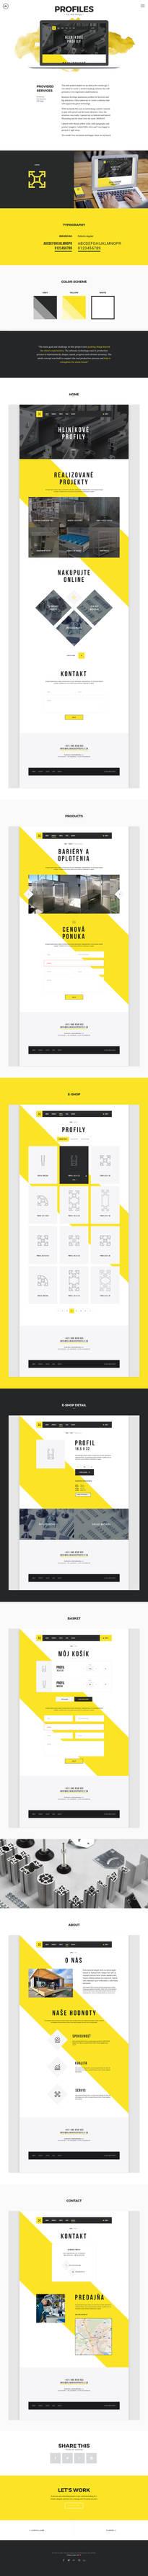 Web design projetc - Profiles